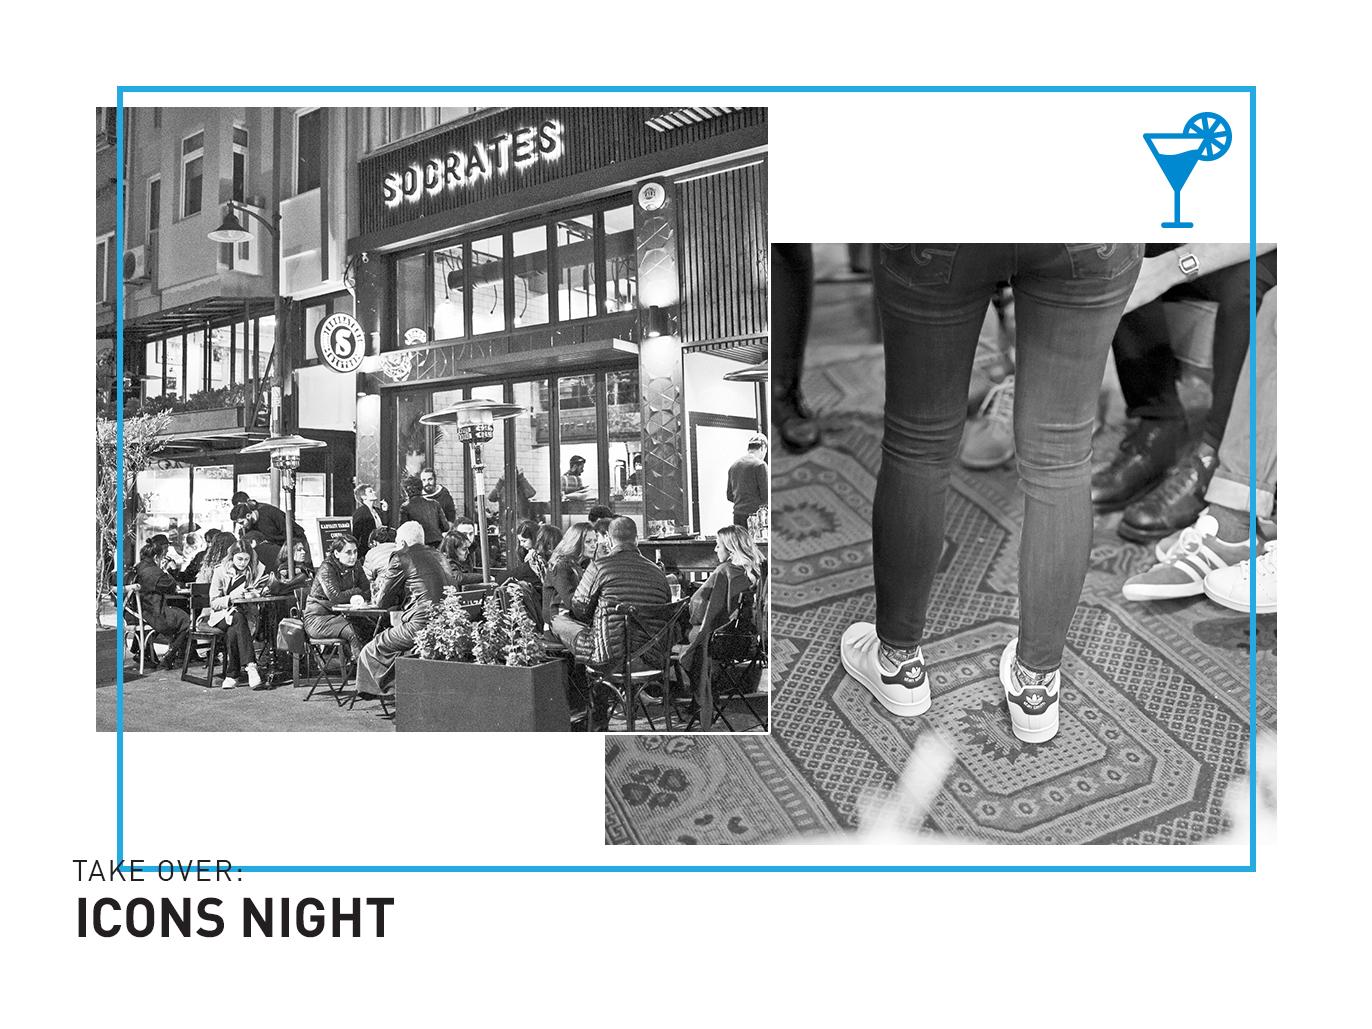 Take Over: Icons Night - Adidas